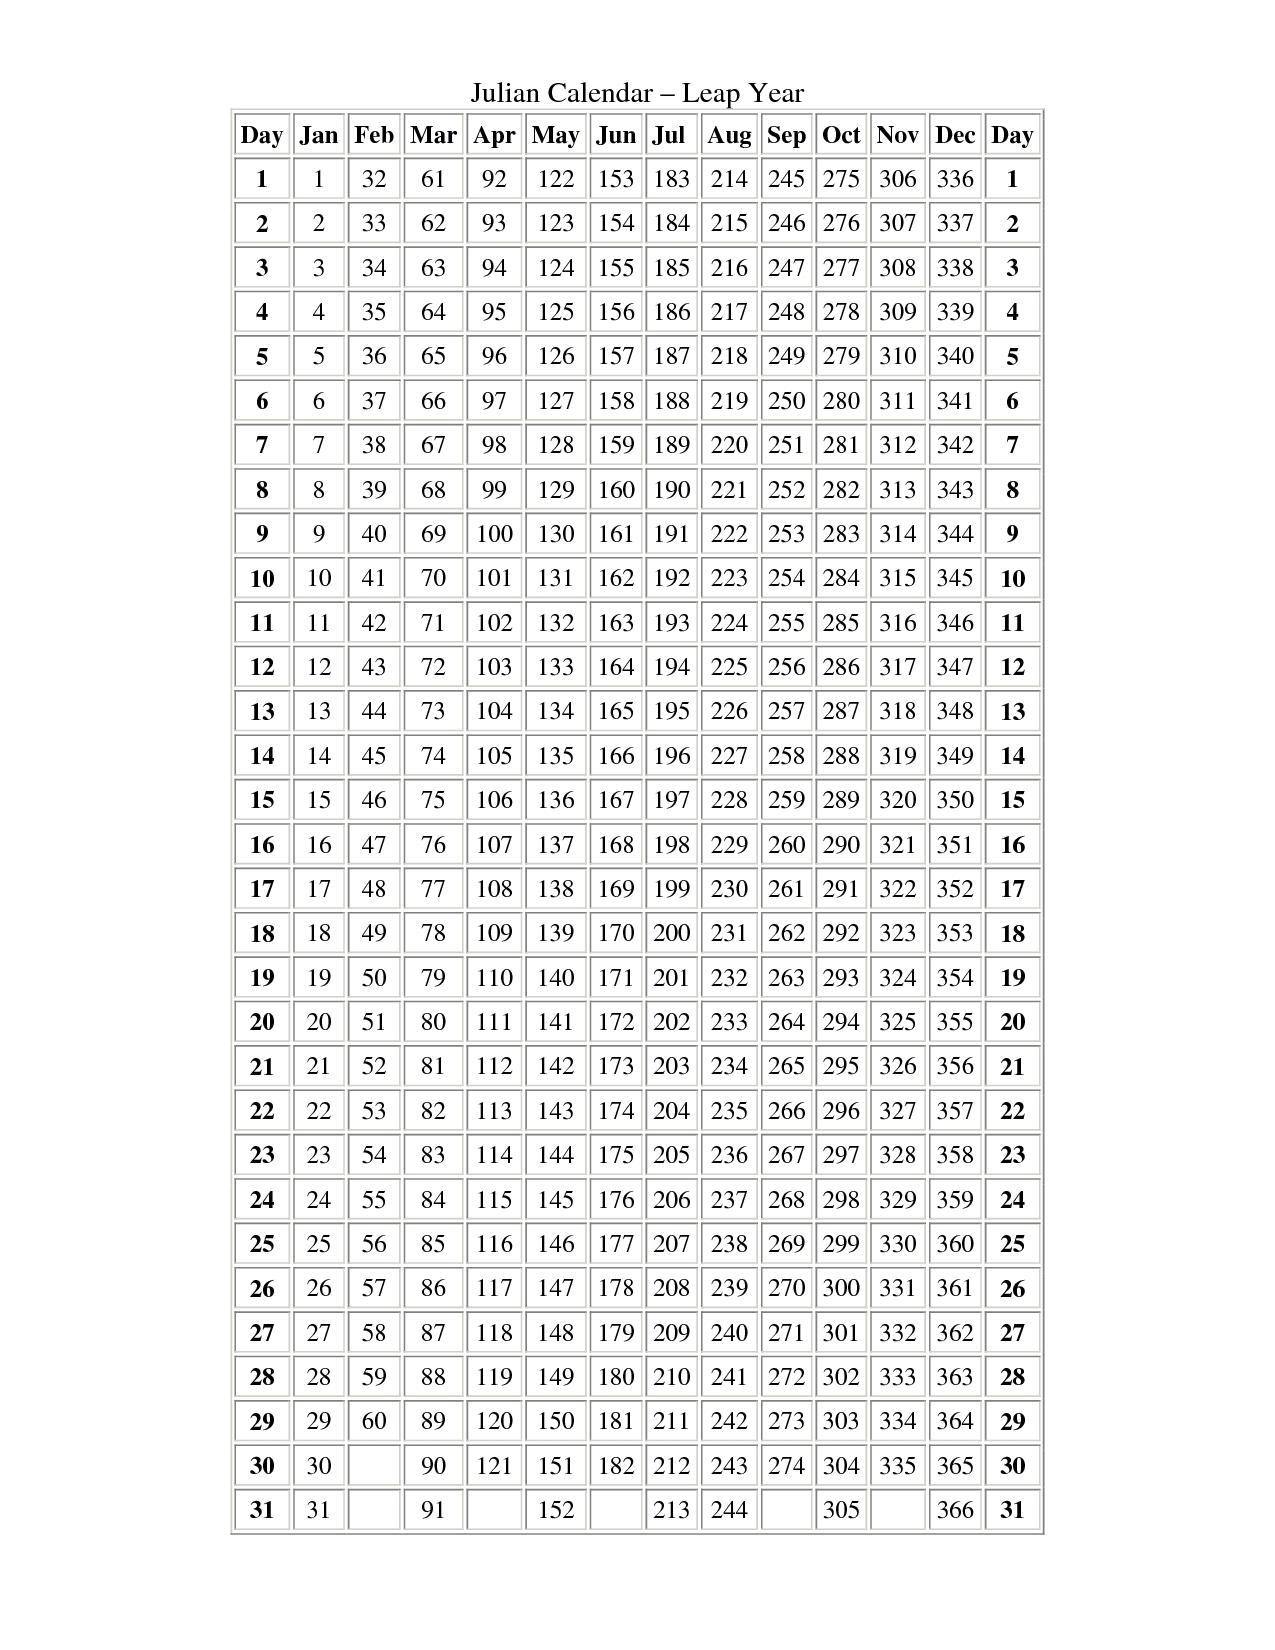 Julian Calendar Leap Year And Non Leap Year | Printable Calendar Template 2021